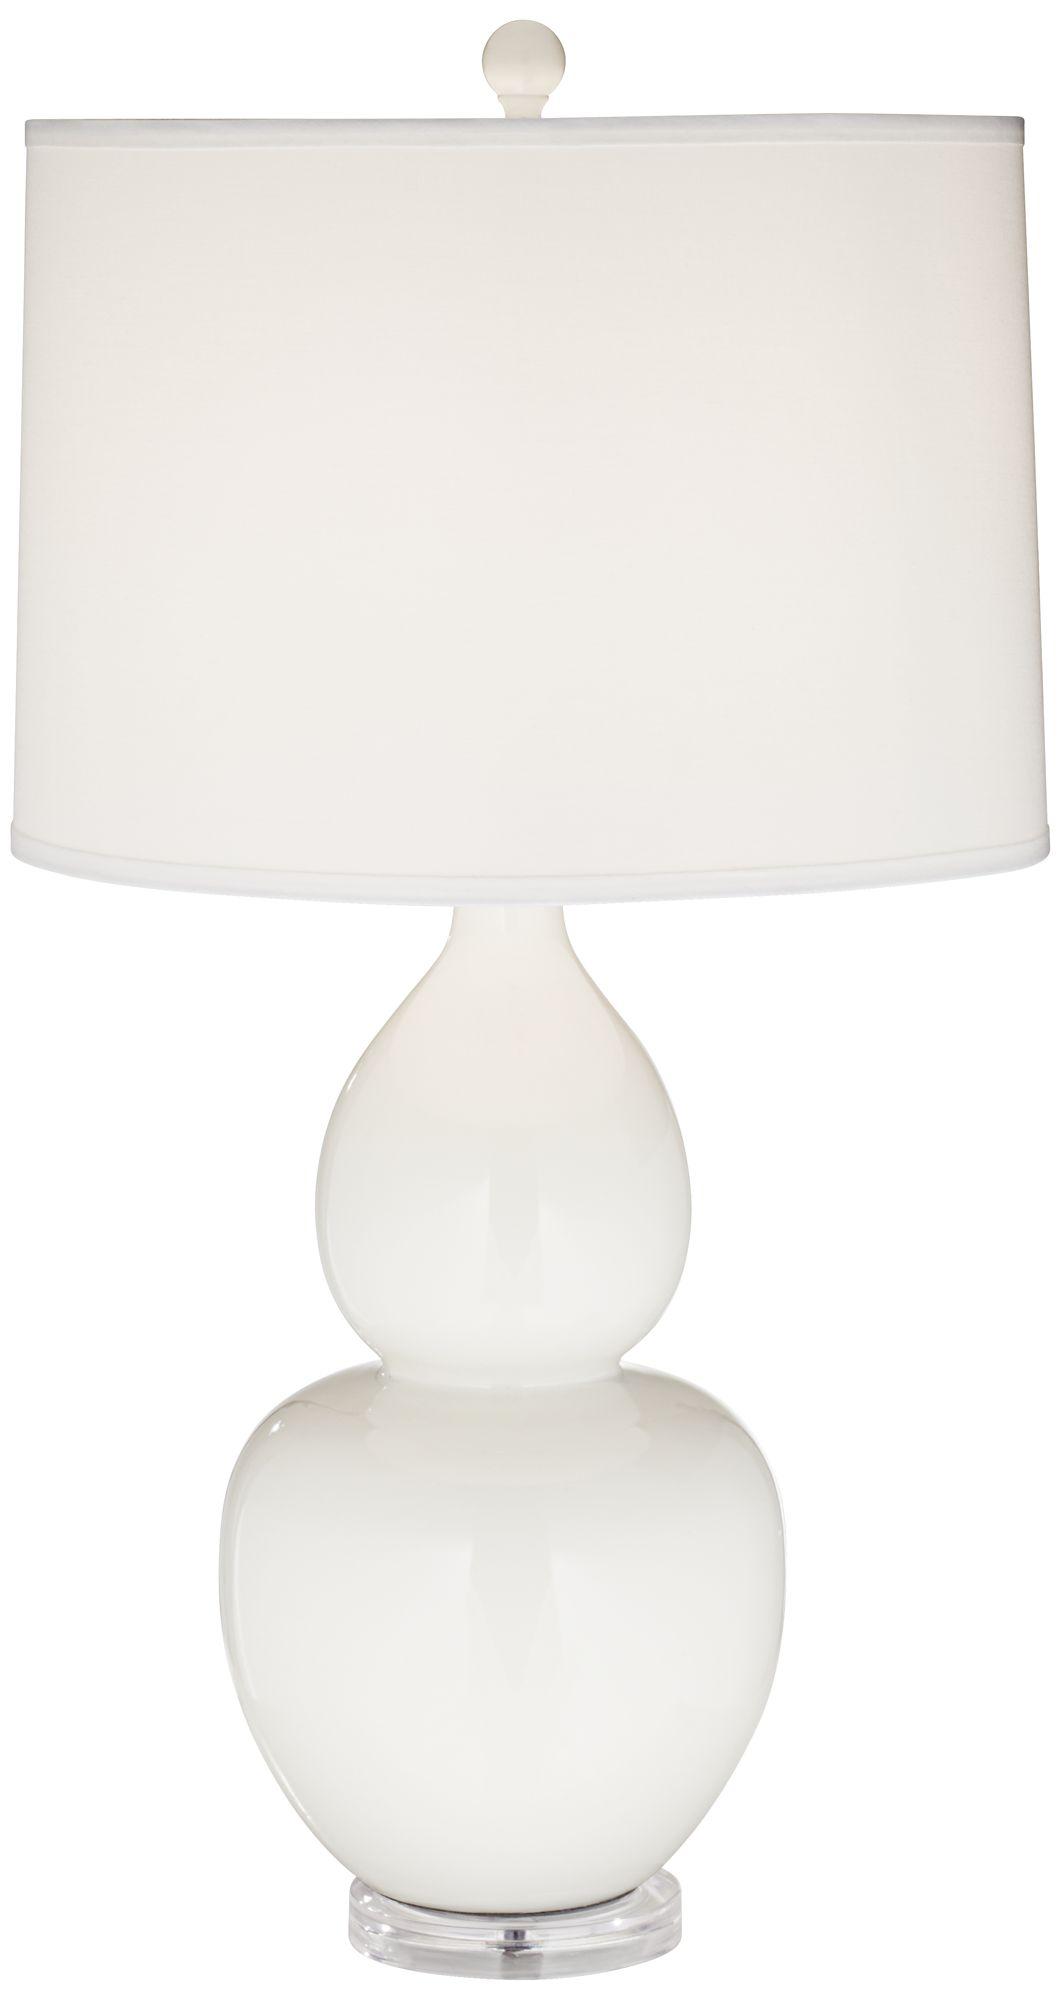 Merveilleux Contempo White Double Gourd Ceramic Table Lamp